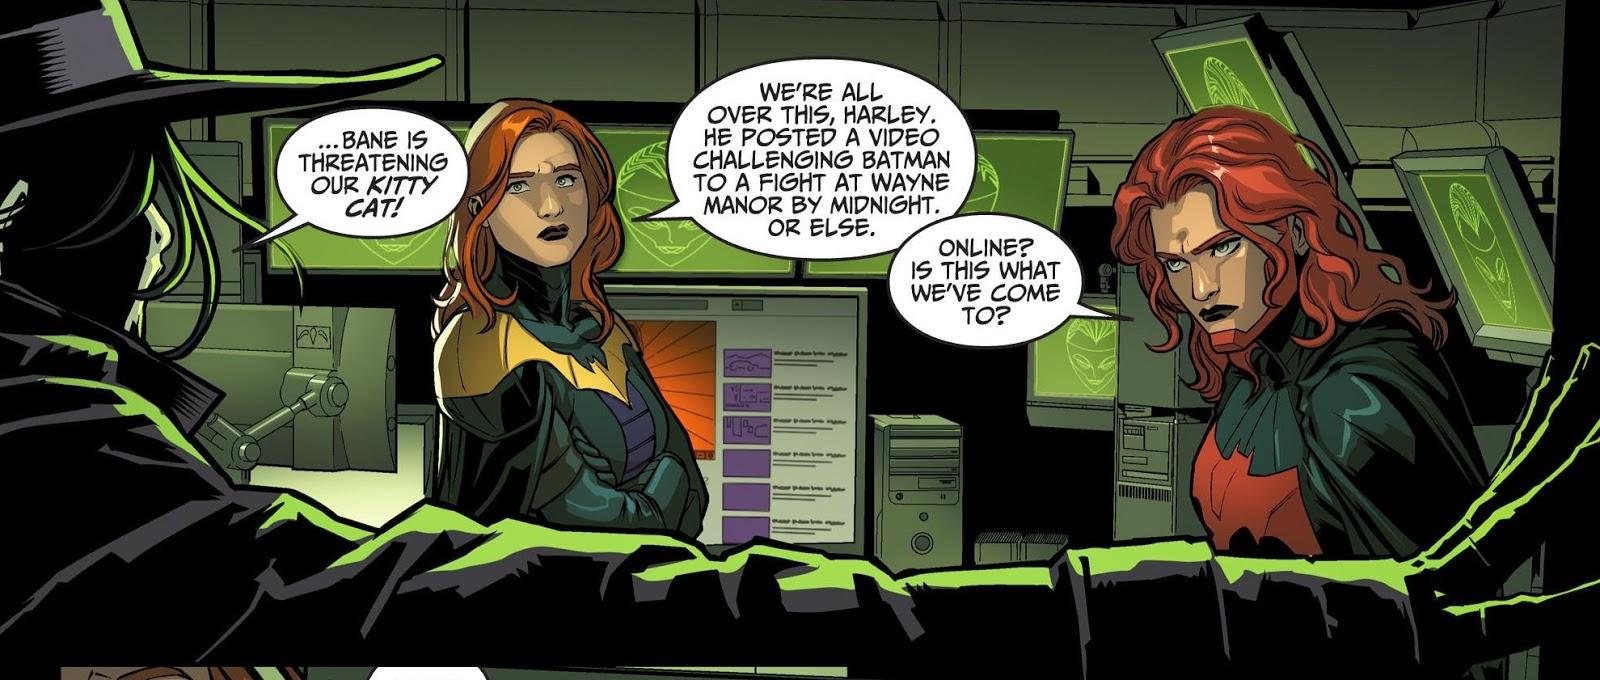 Injustice versus batman catwoman road to injustice